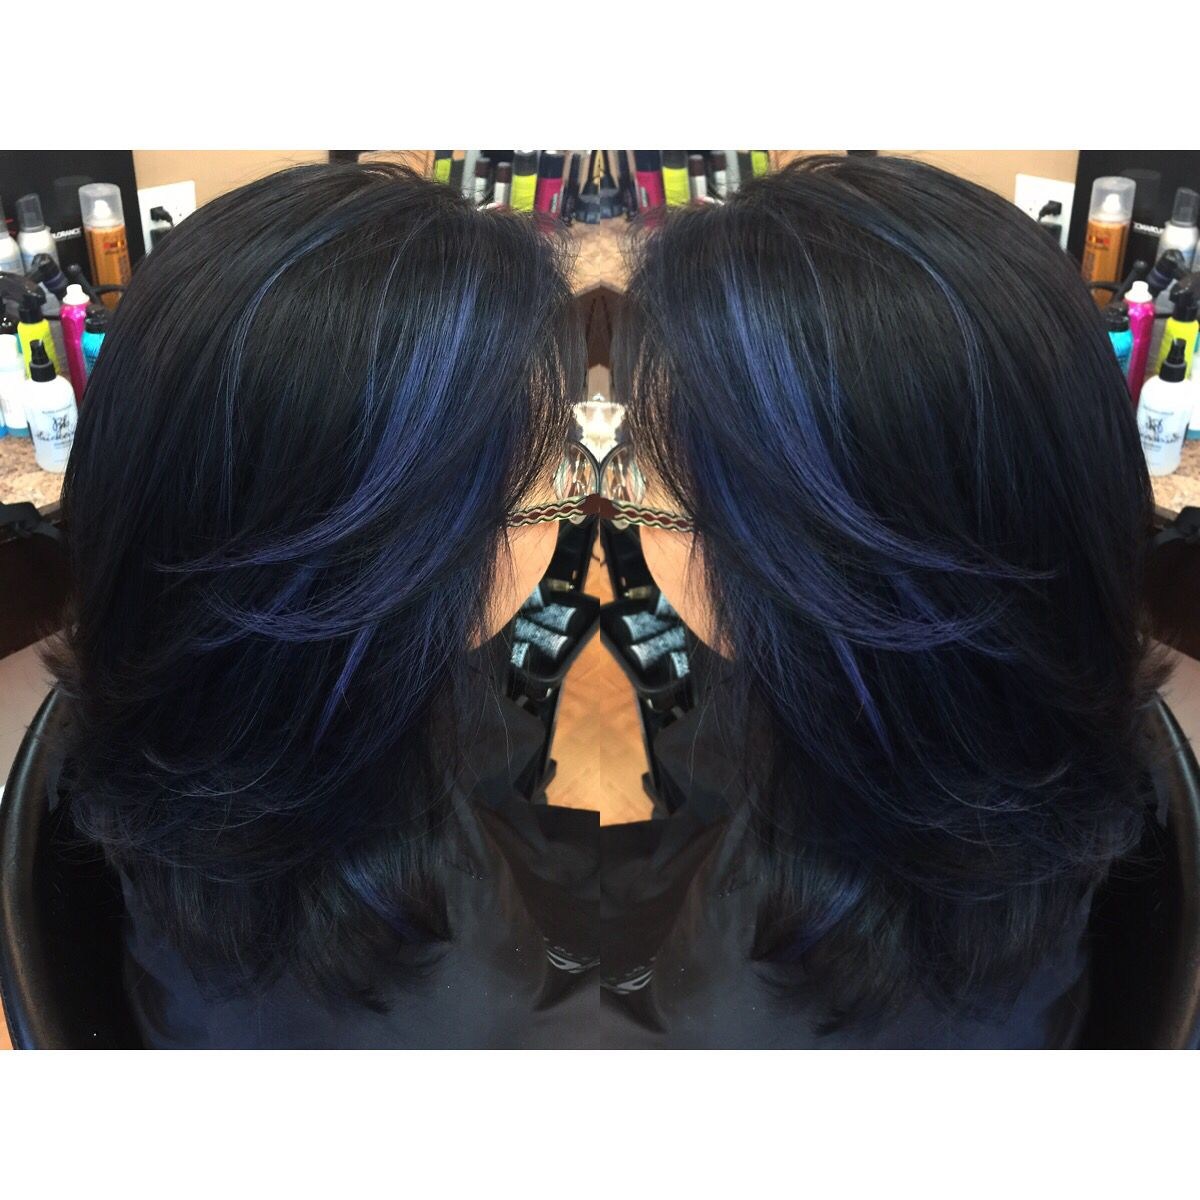 Cobalt Blue Peekaboo Highlights In Black Long Hair Hair Styles Blue Hair Blue Hair Highlights